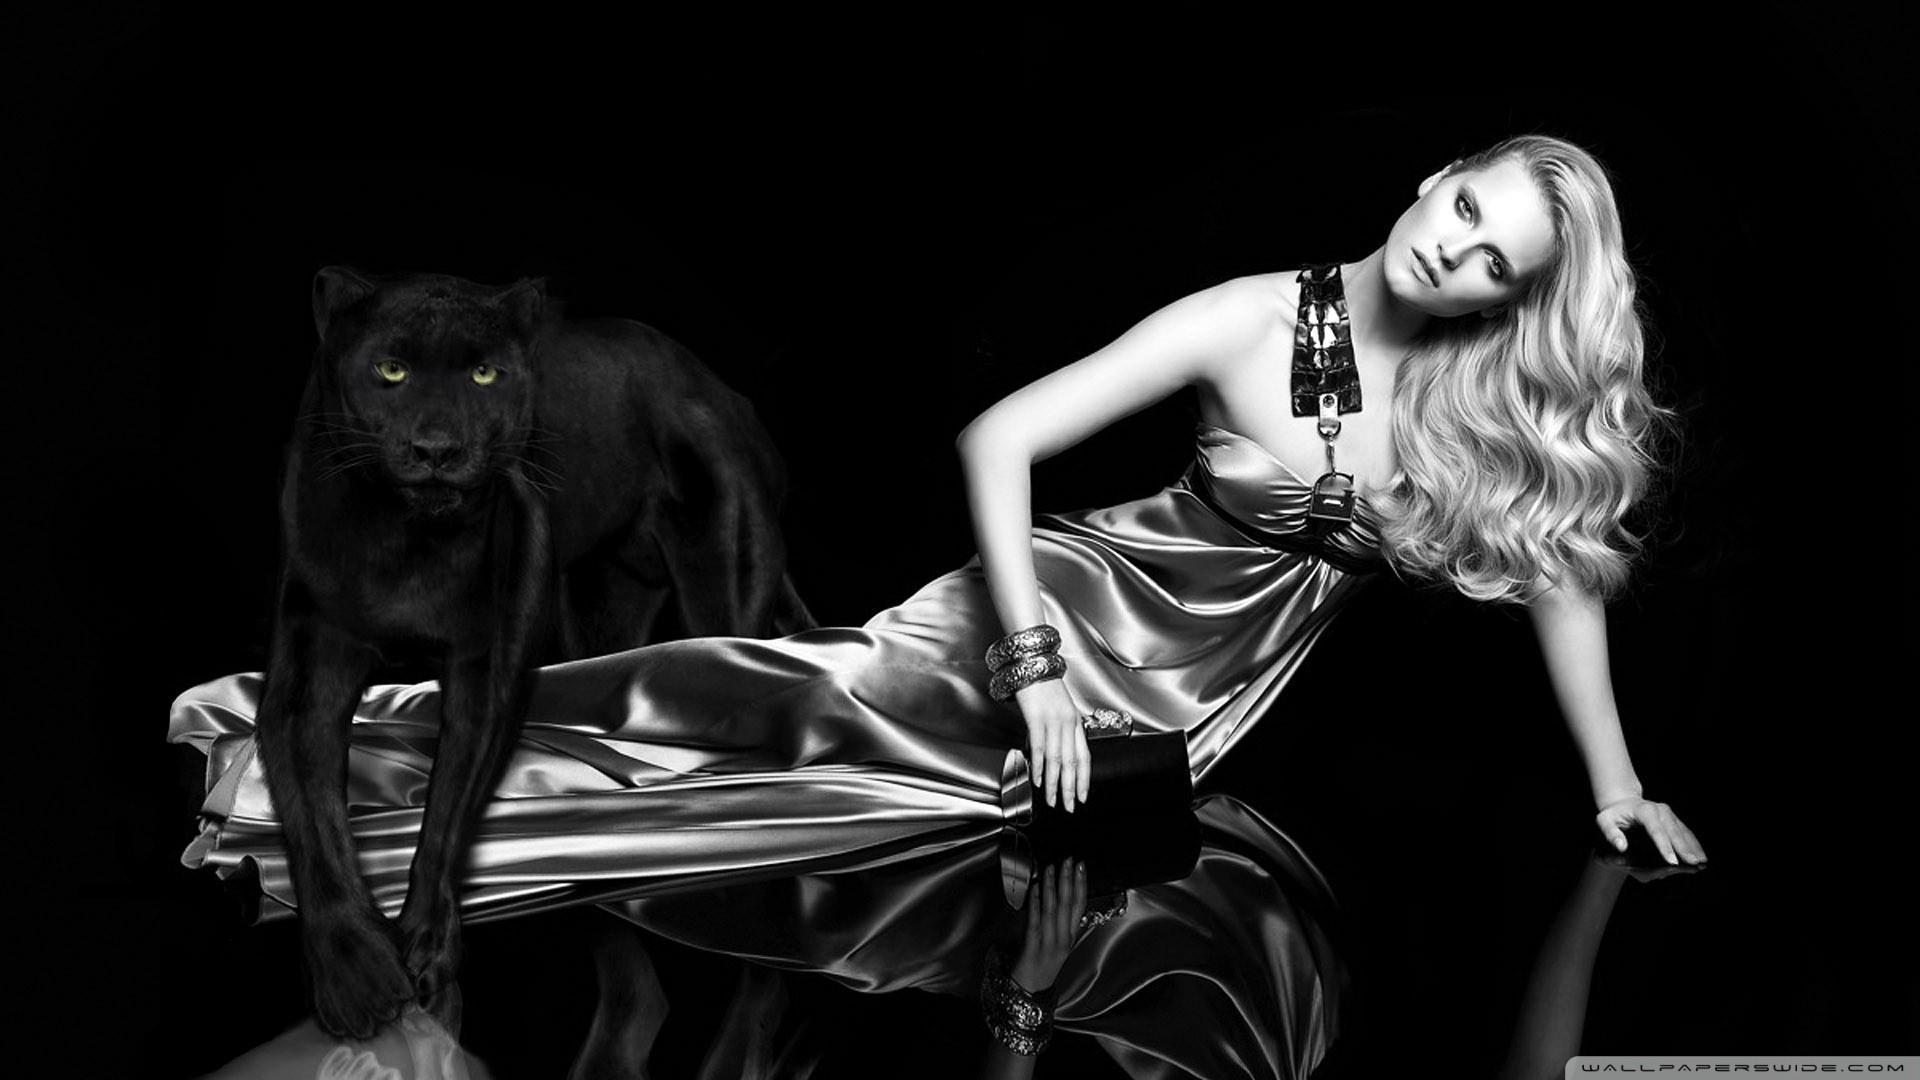 blondes women panthers fashion photography black background - Wallpaper (#1469965) / Wallbase.cc